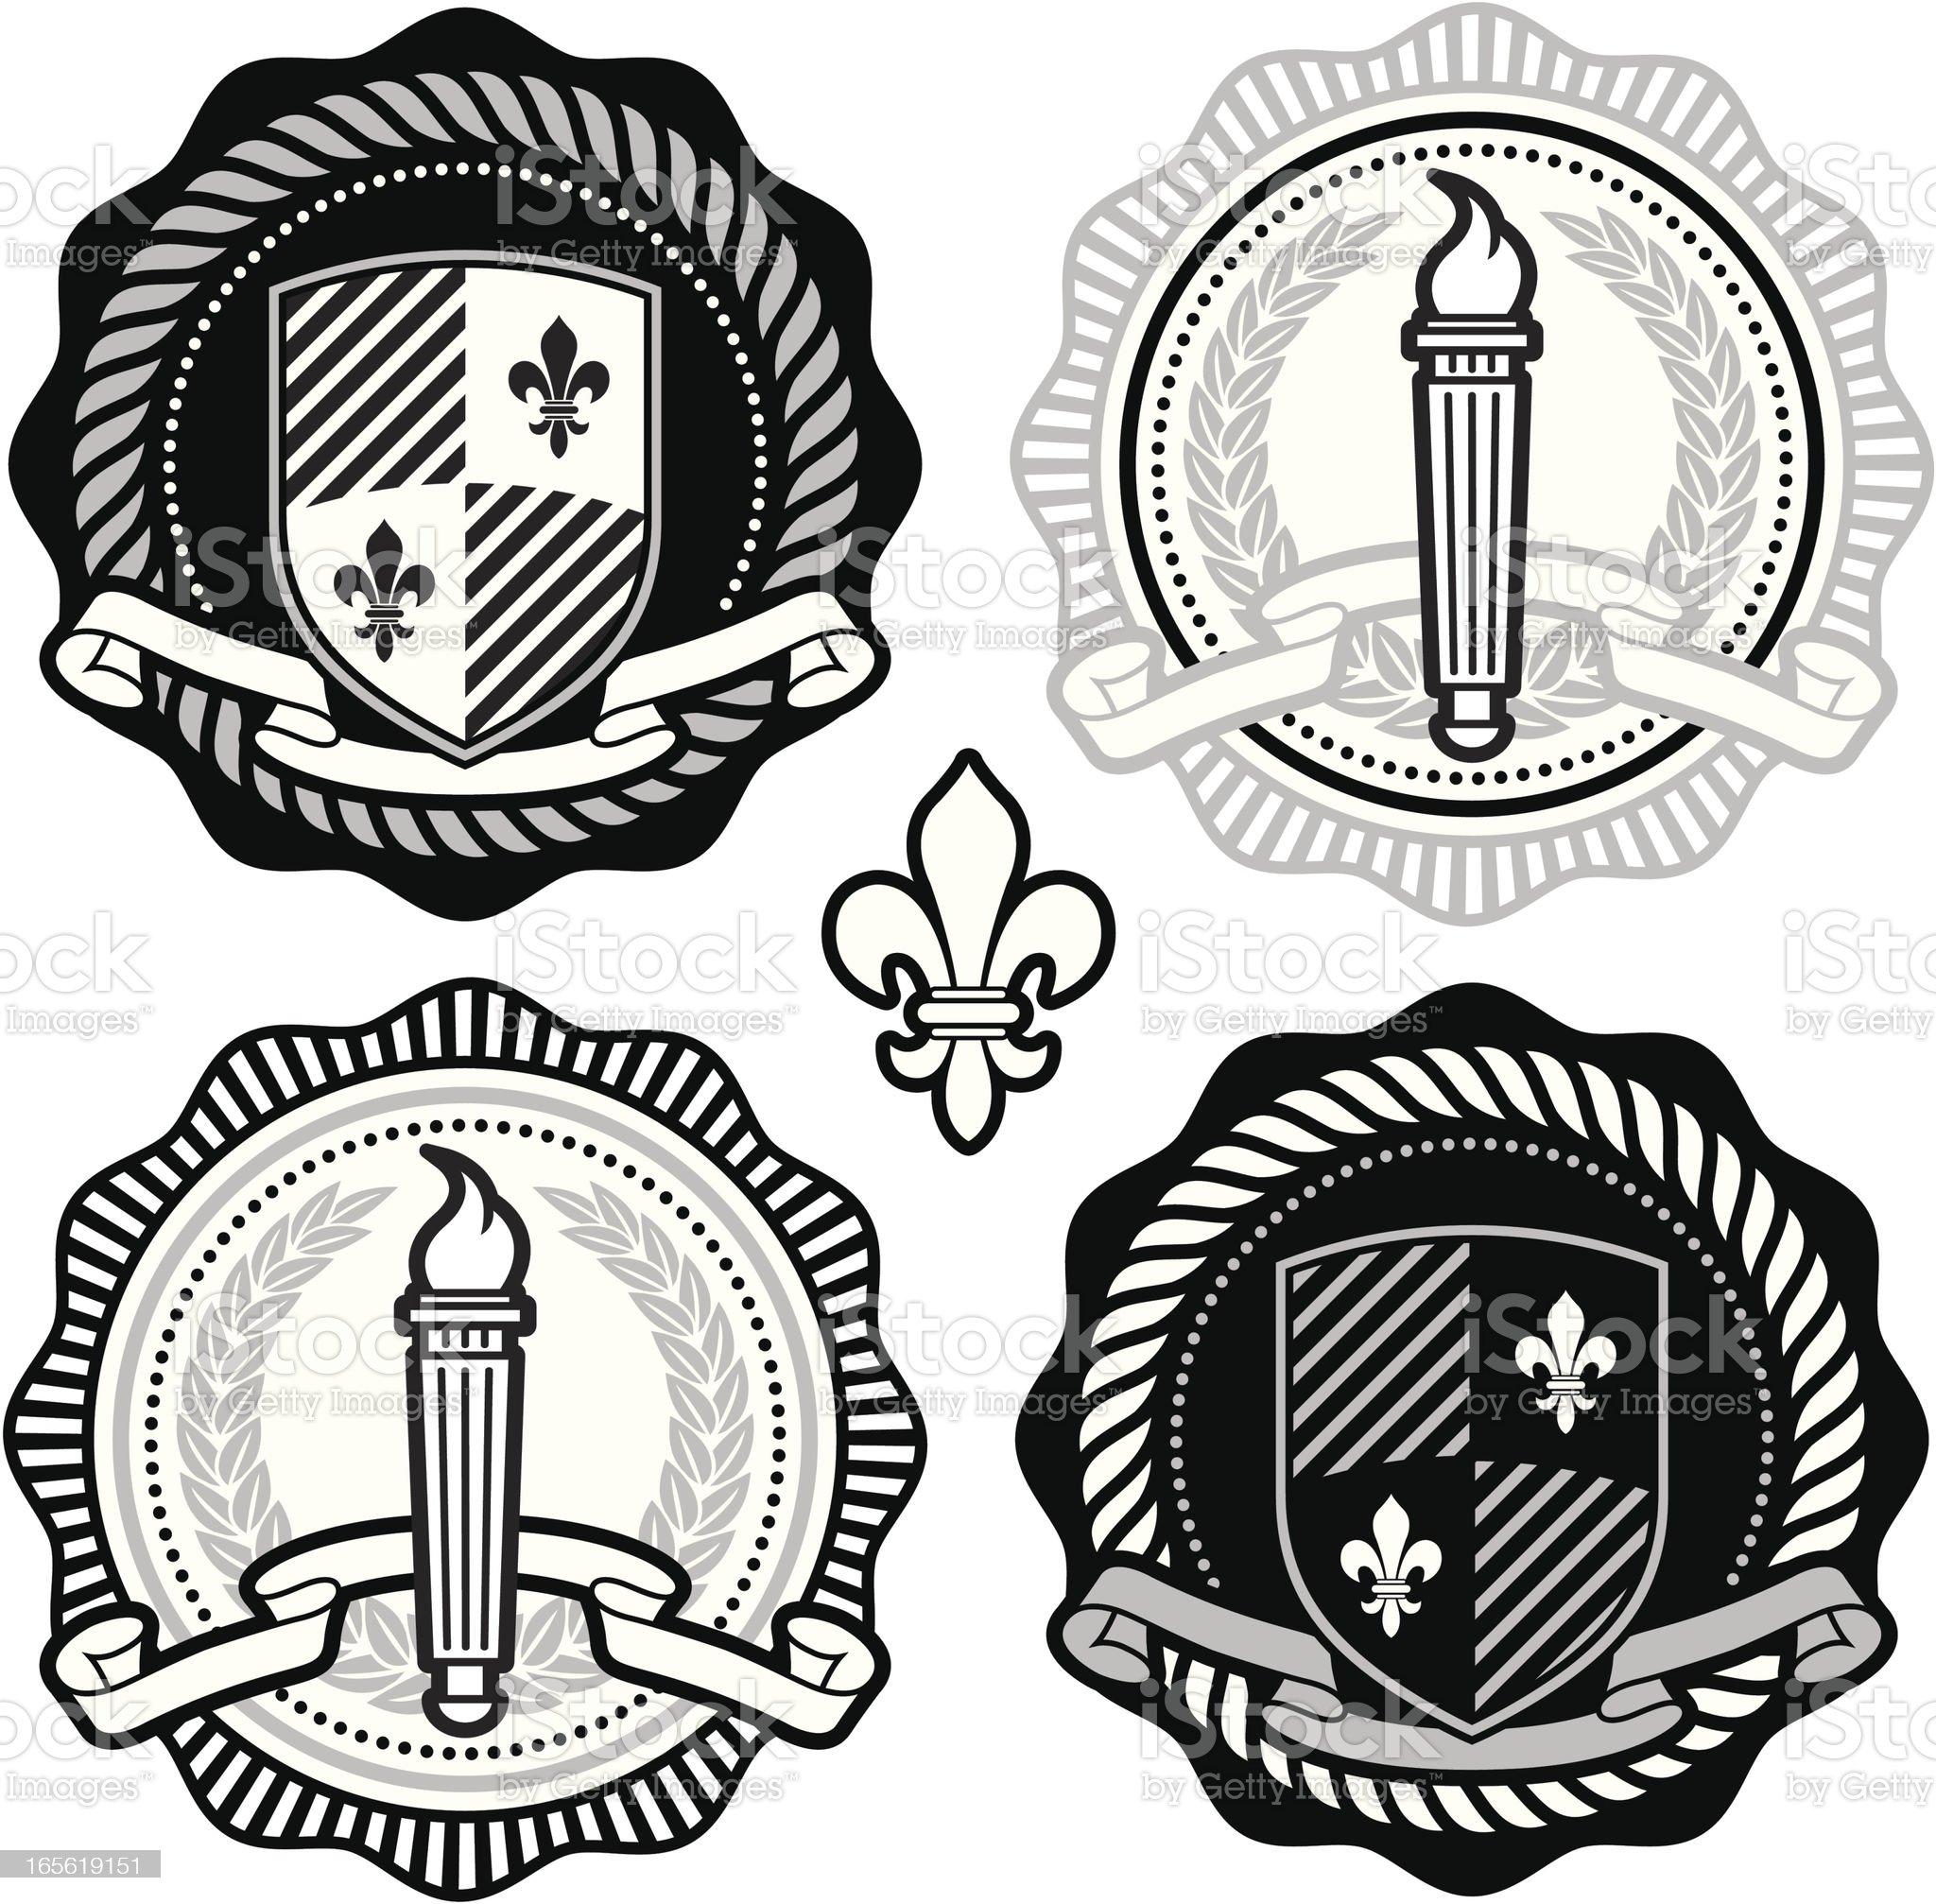 Collegiate seals royalty-free stock vector art